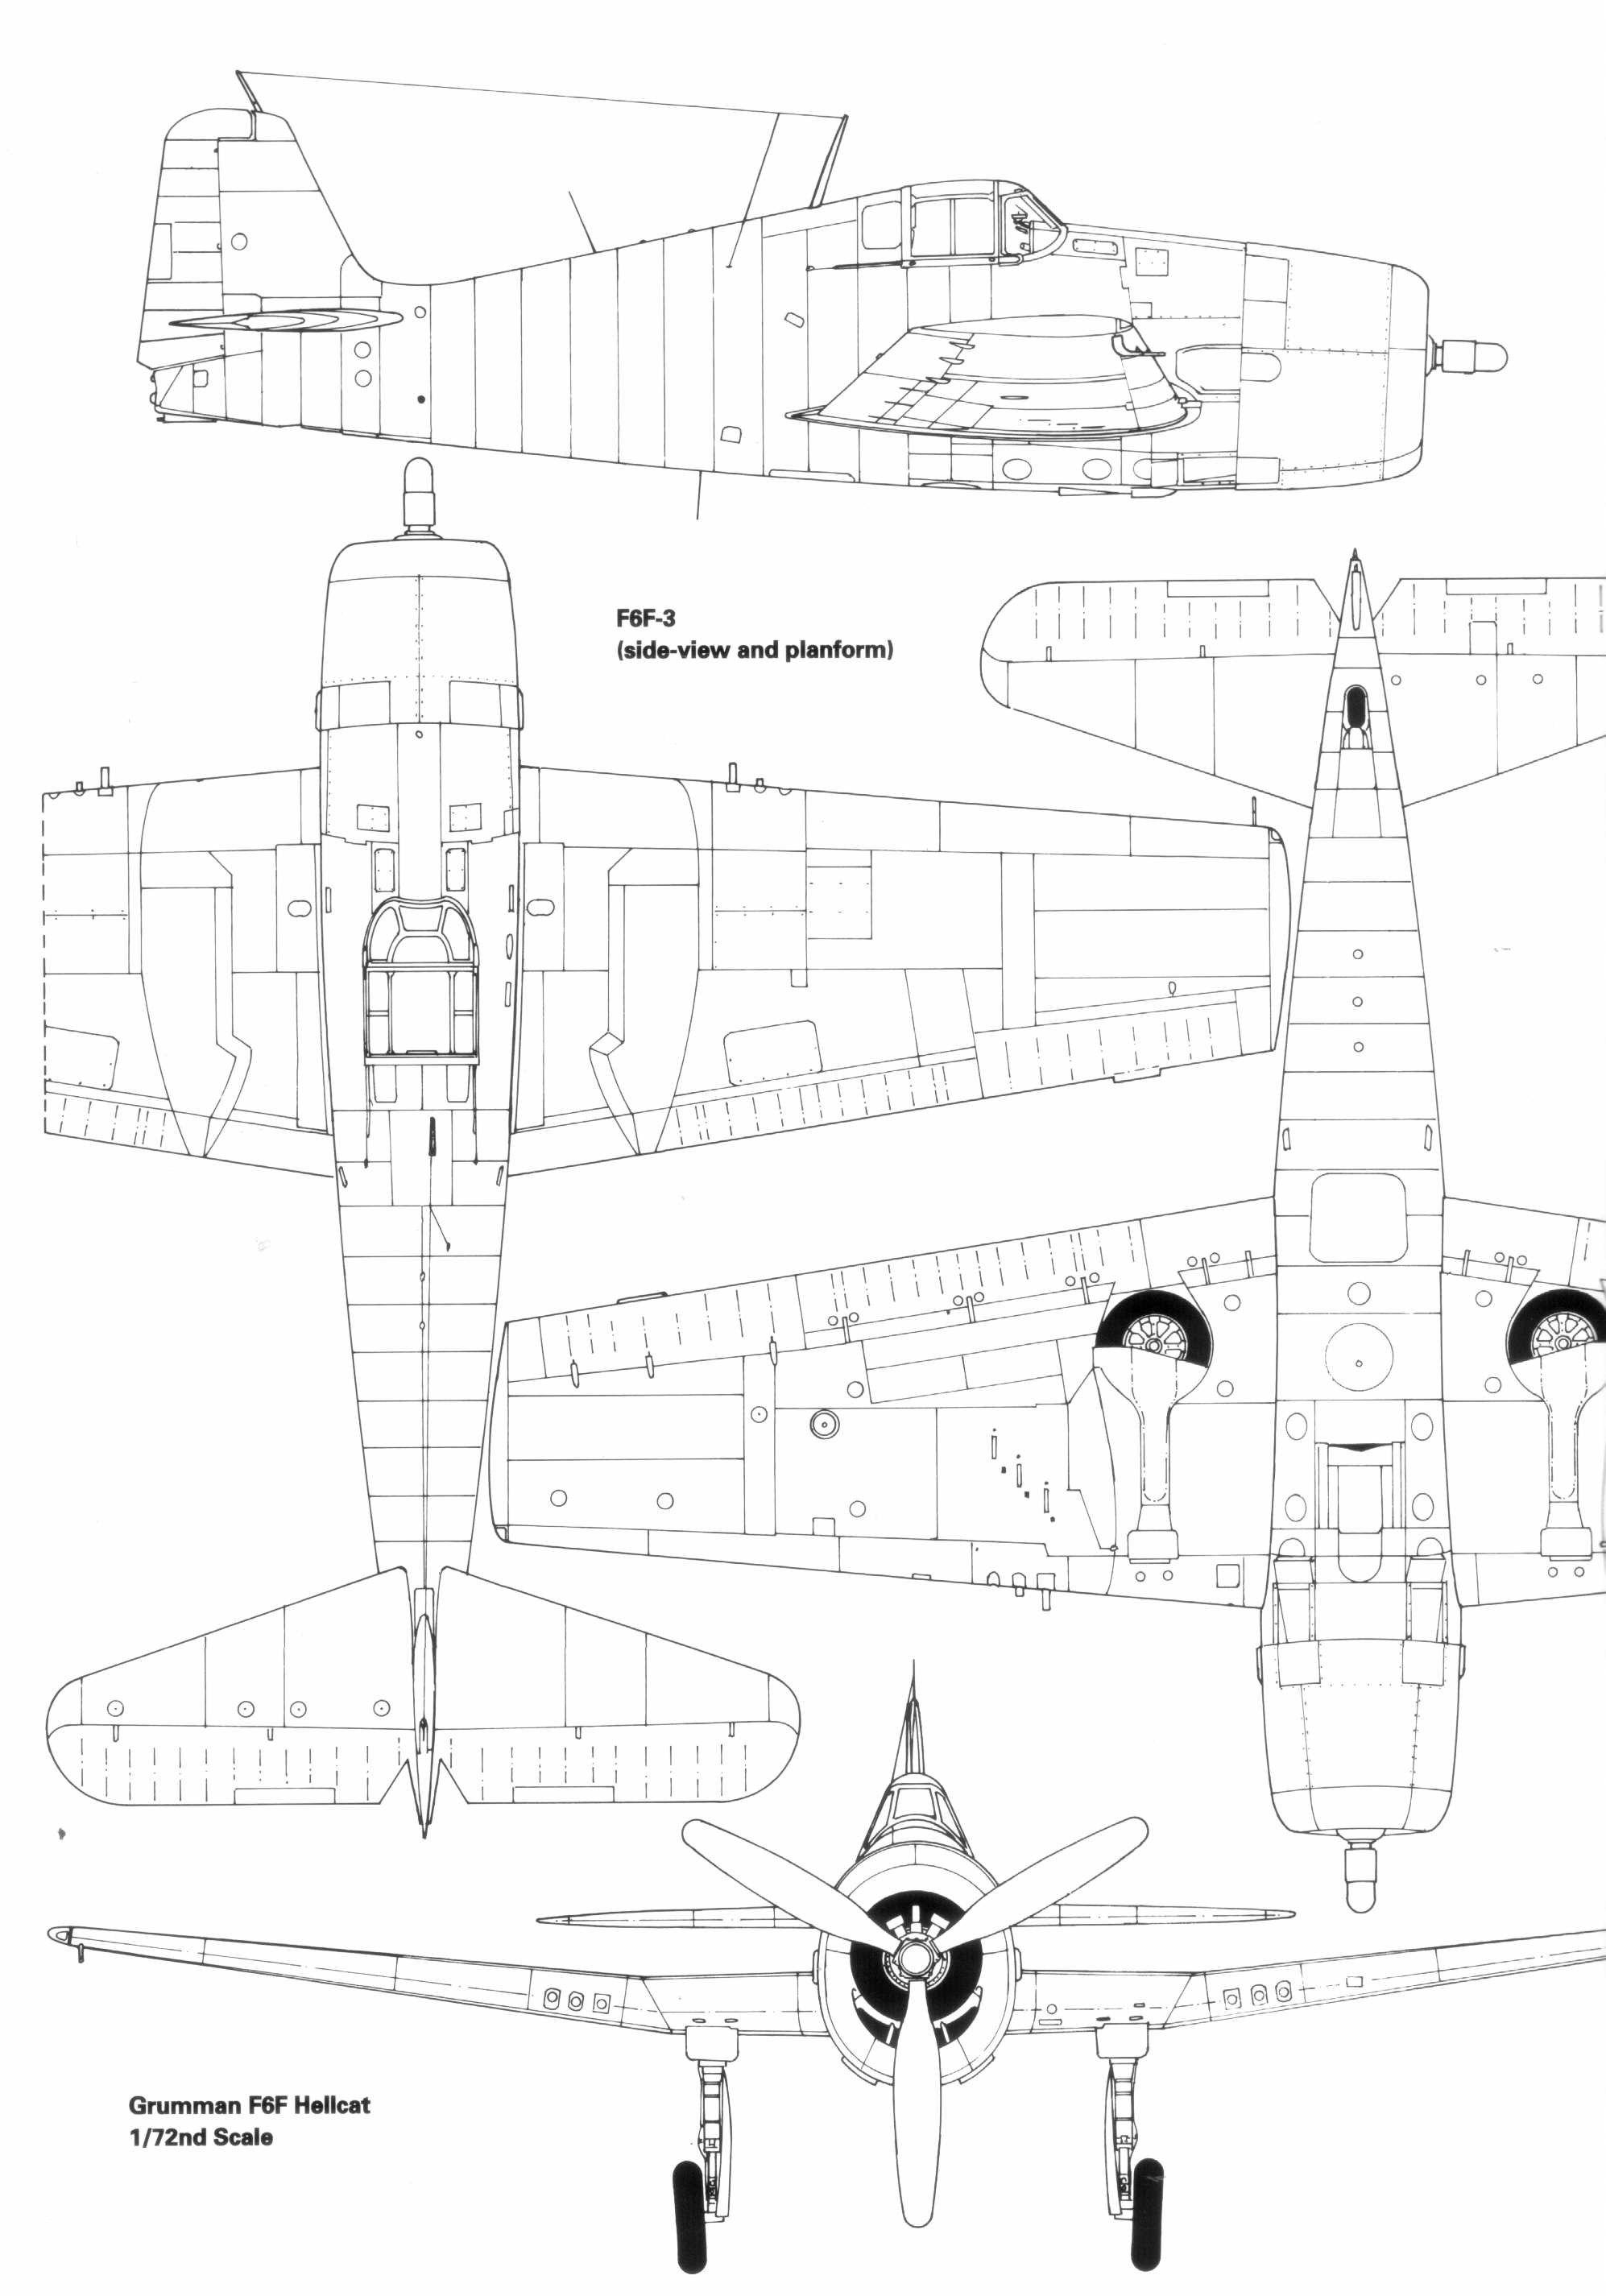 F6f Hellcat Diagram Expert Wiring B 26 Marauder Engine Grumman Blueprint Download Free For 3d Rh Pinterest Com Wwii